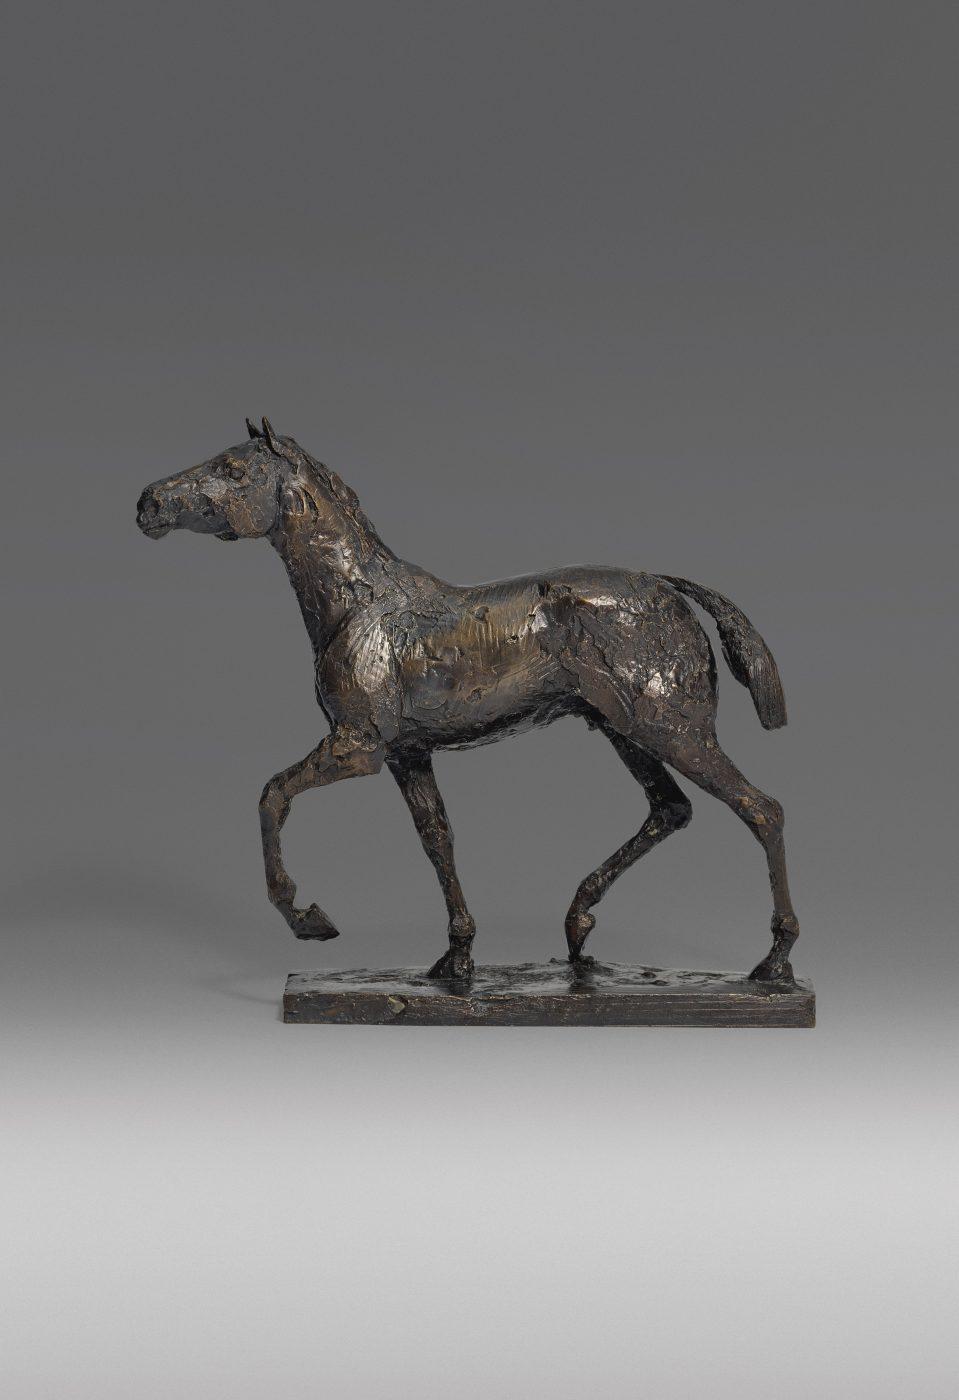 Dame Elisabeth Frink, CH RA (1930-1993), Horse Maquette